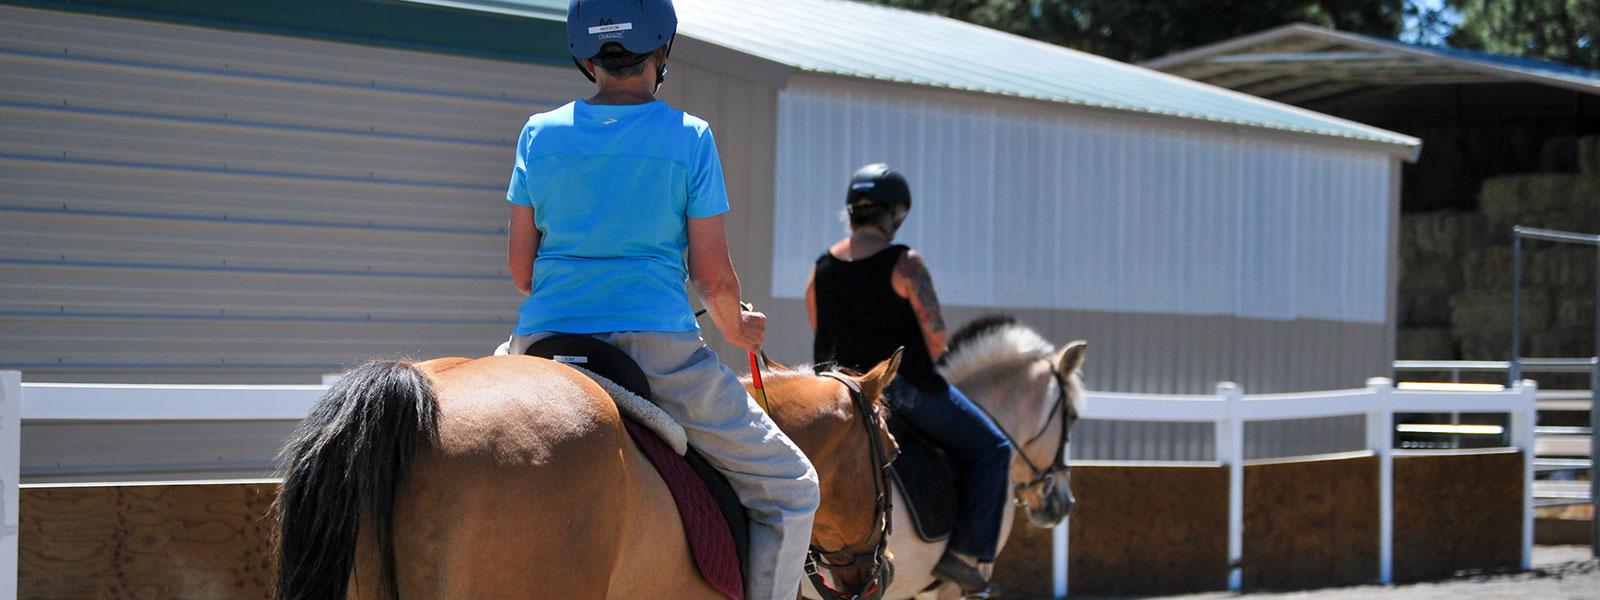 the backs of two riders on horses - horsemanship